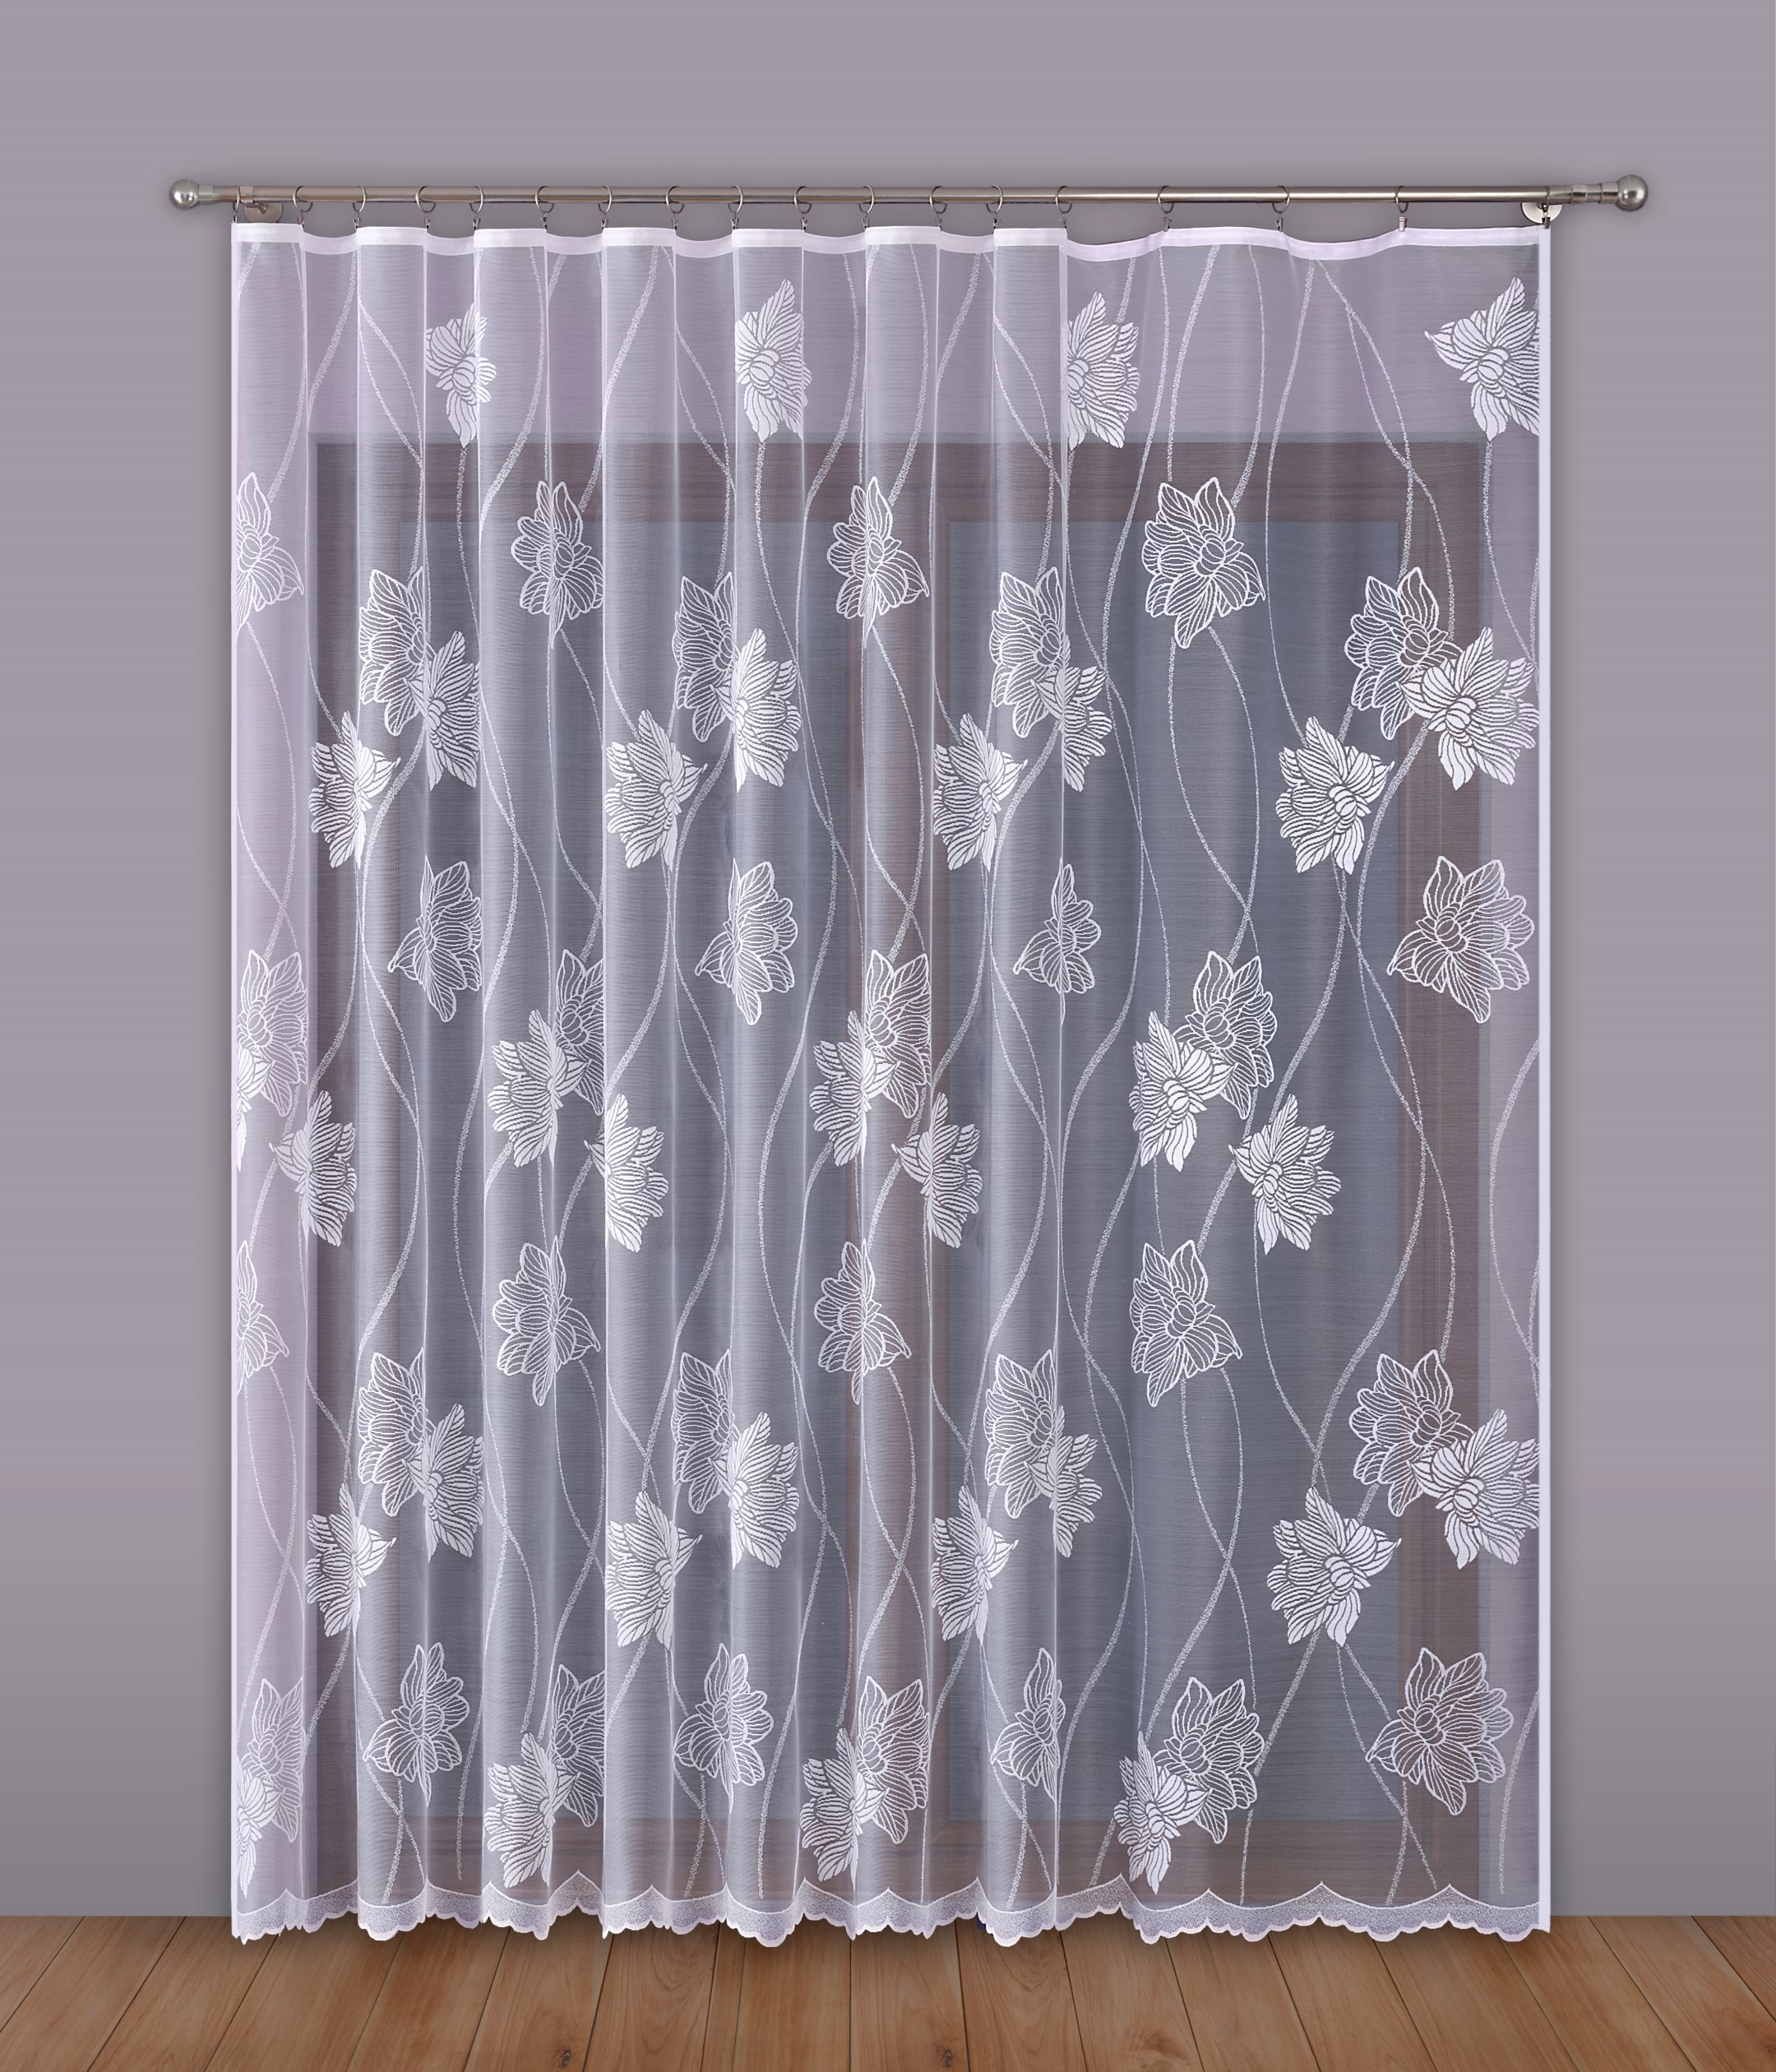 Шторы Primavera Классические шторы Thyrza Цвет: Белый шторы primavera классические шторы larry цвет белый